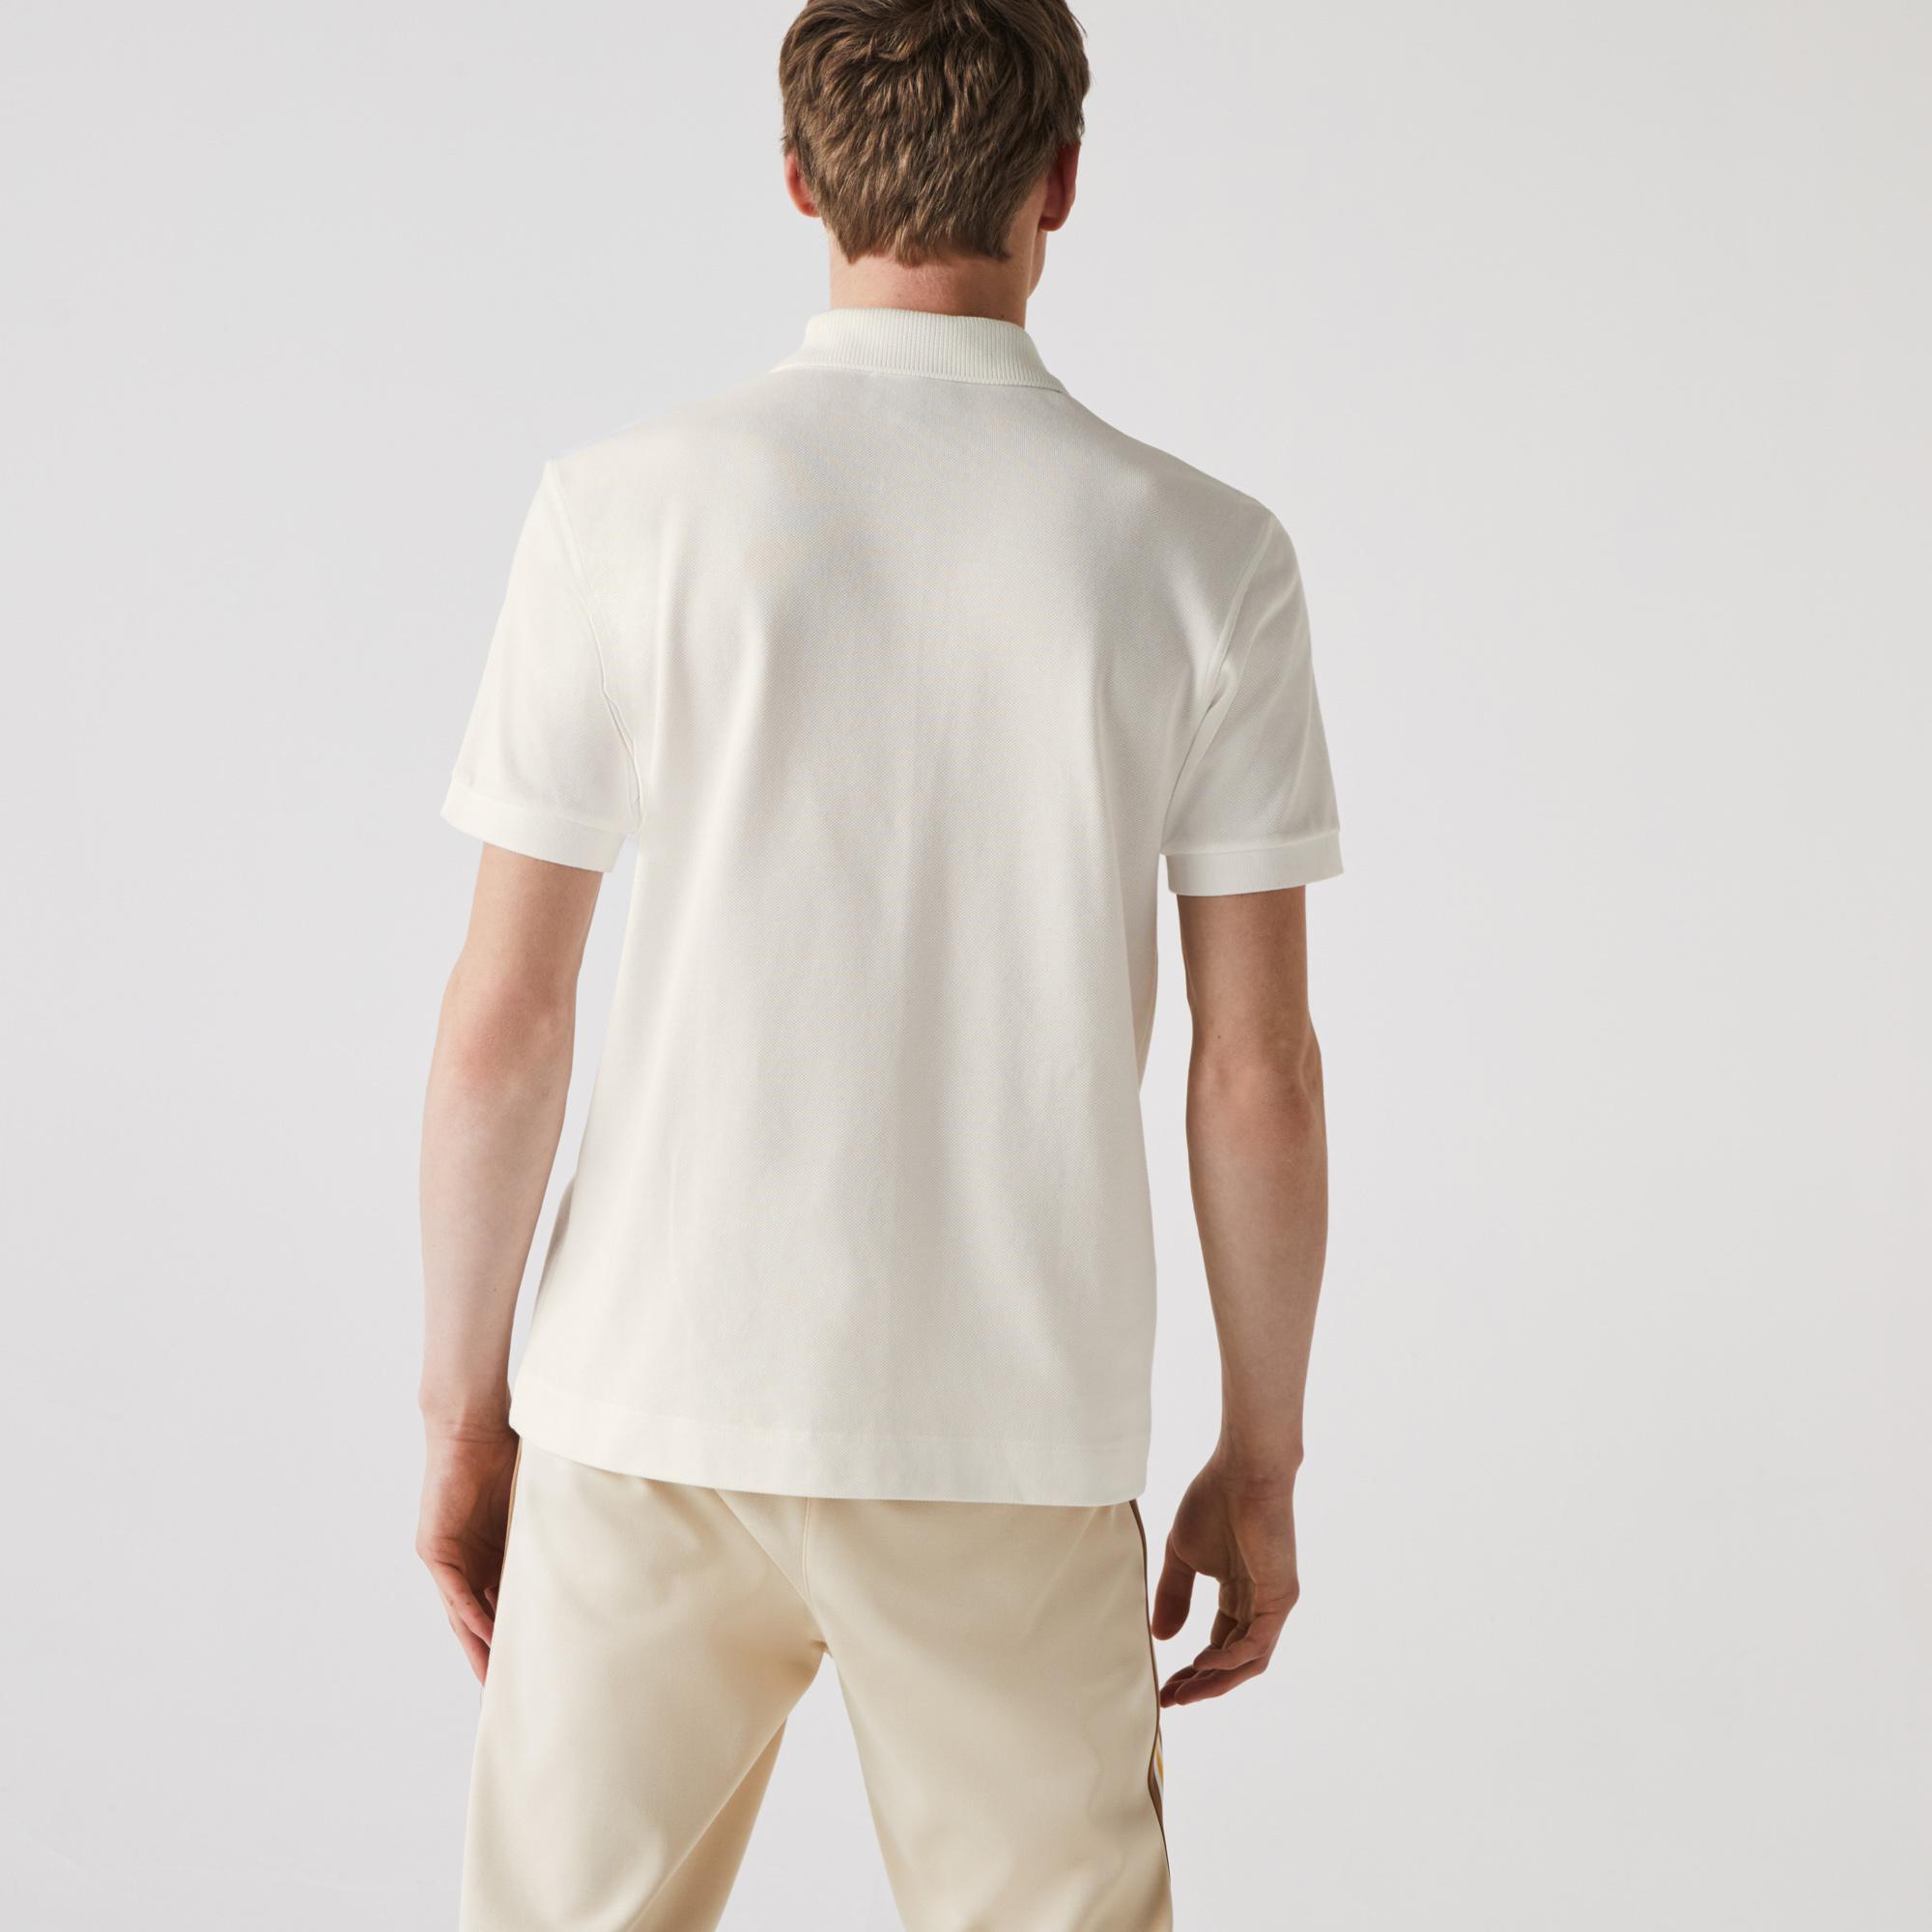 Lacoste Erkek Klasik Fit Organik Pamuk Beyaz L1221 Polo